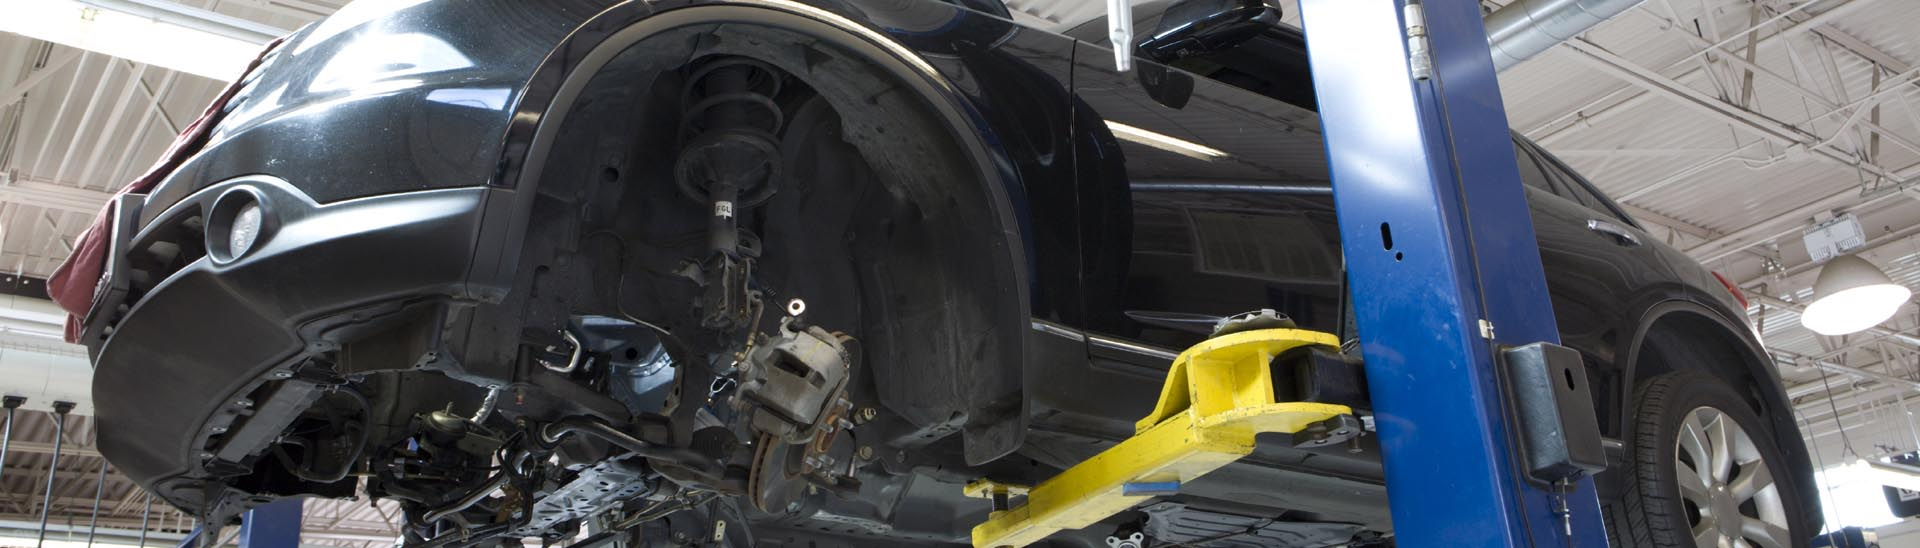 Business insurance auto service